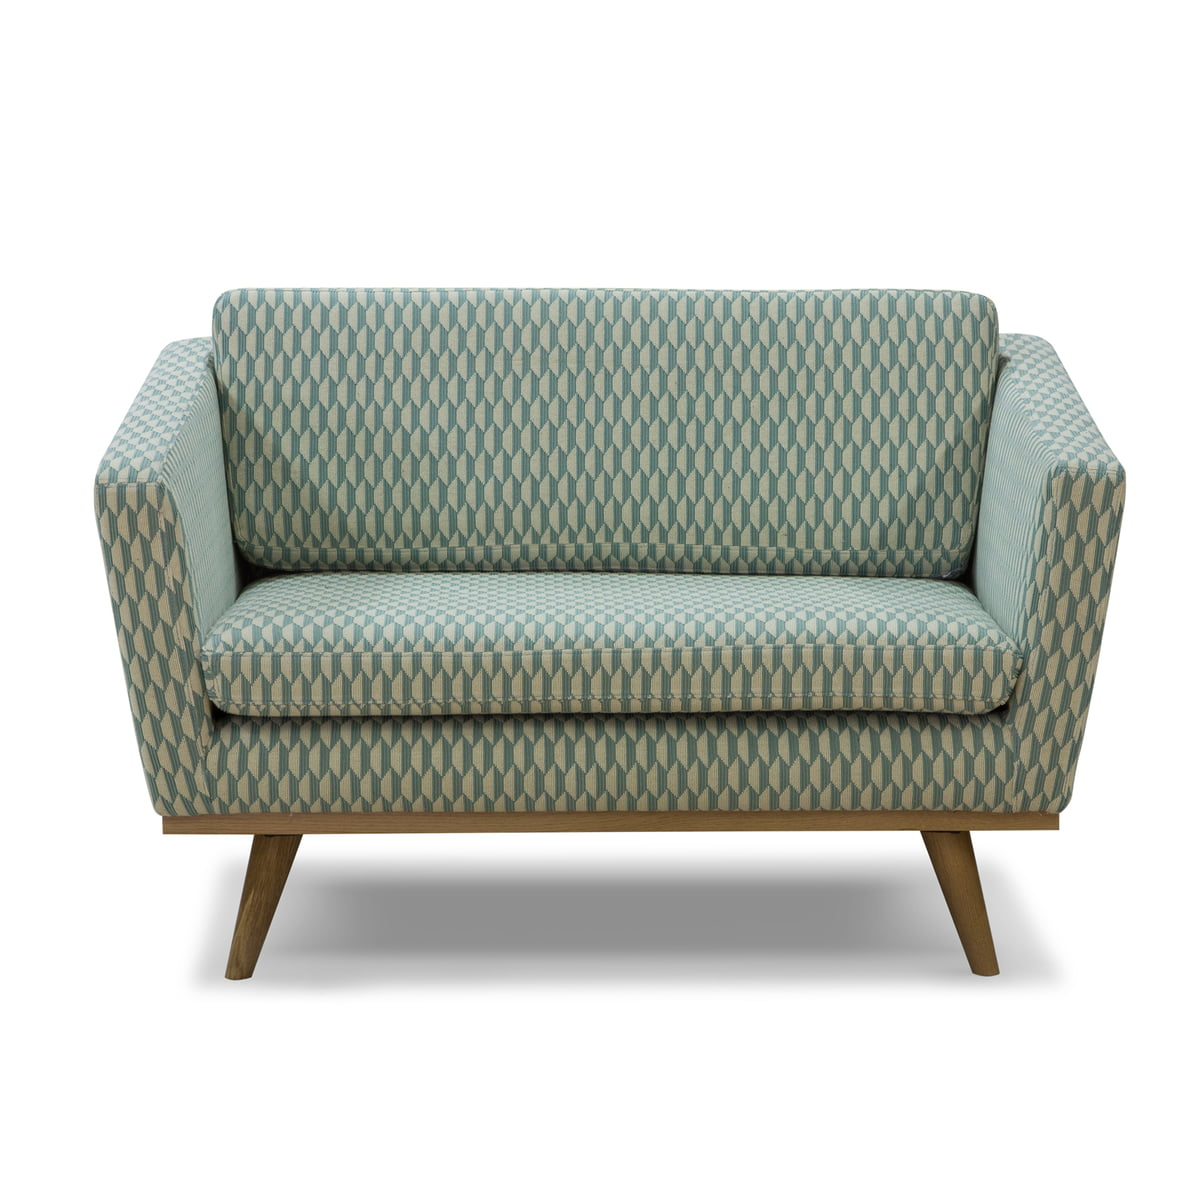 fifties sofa 120 von red edition. Black Bedroom Furniture Sets. Home Design Ideas